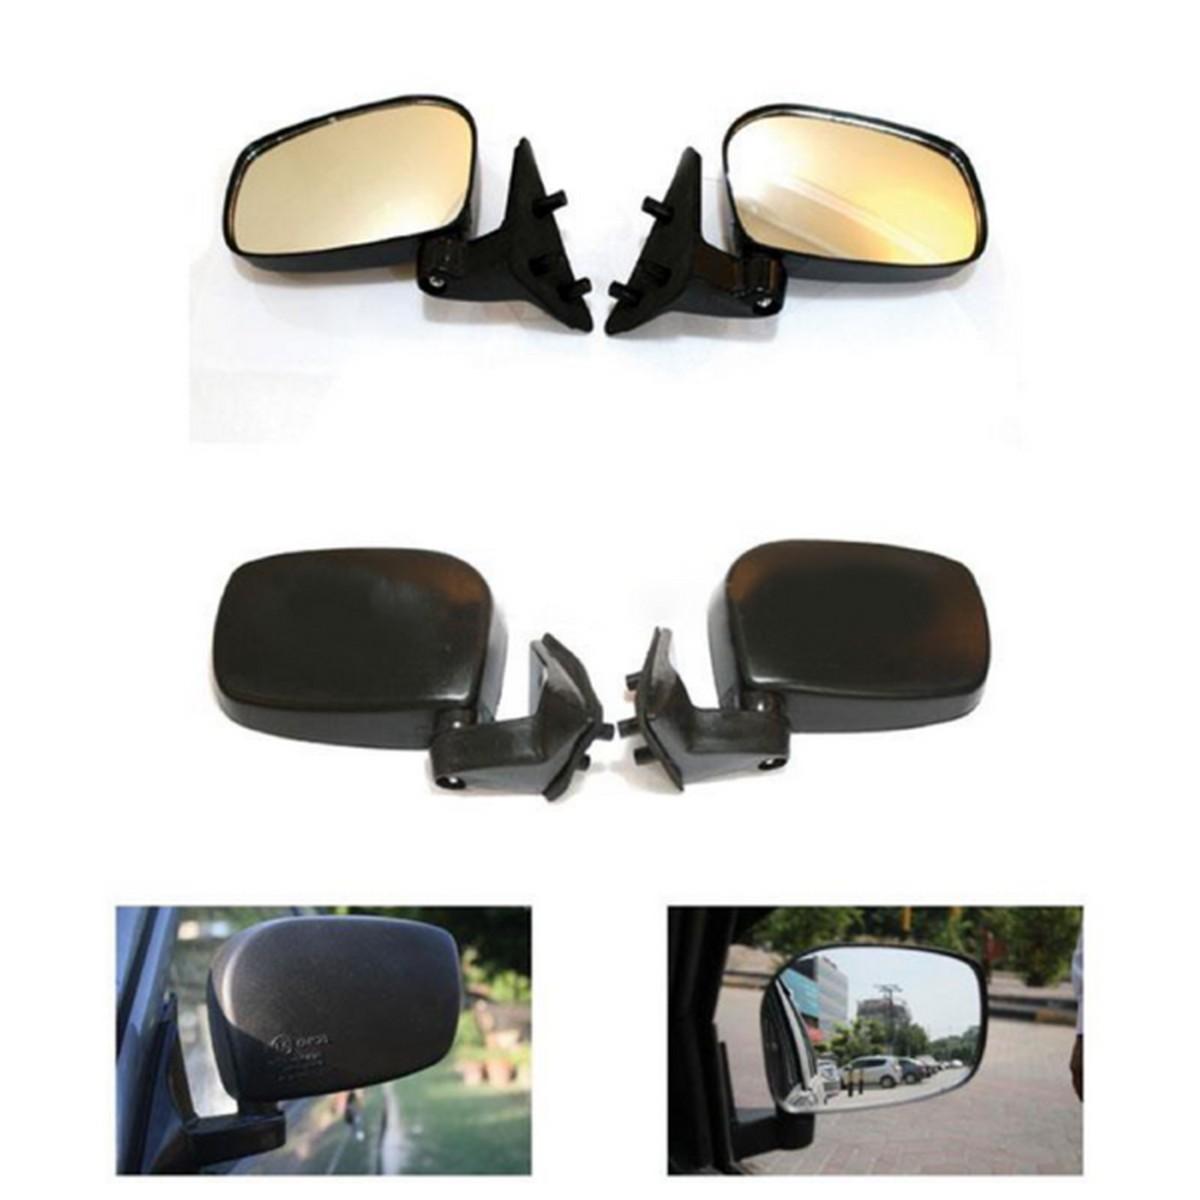 Suzuki Mehran + Khyber Side Mirrors - Pair | Wide Angle | Anti Glare Lens